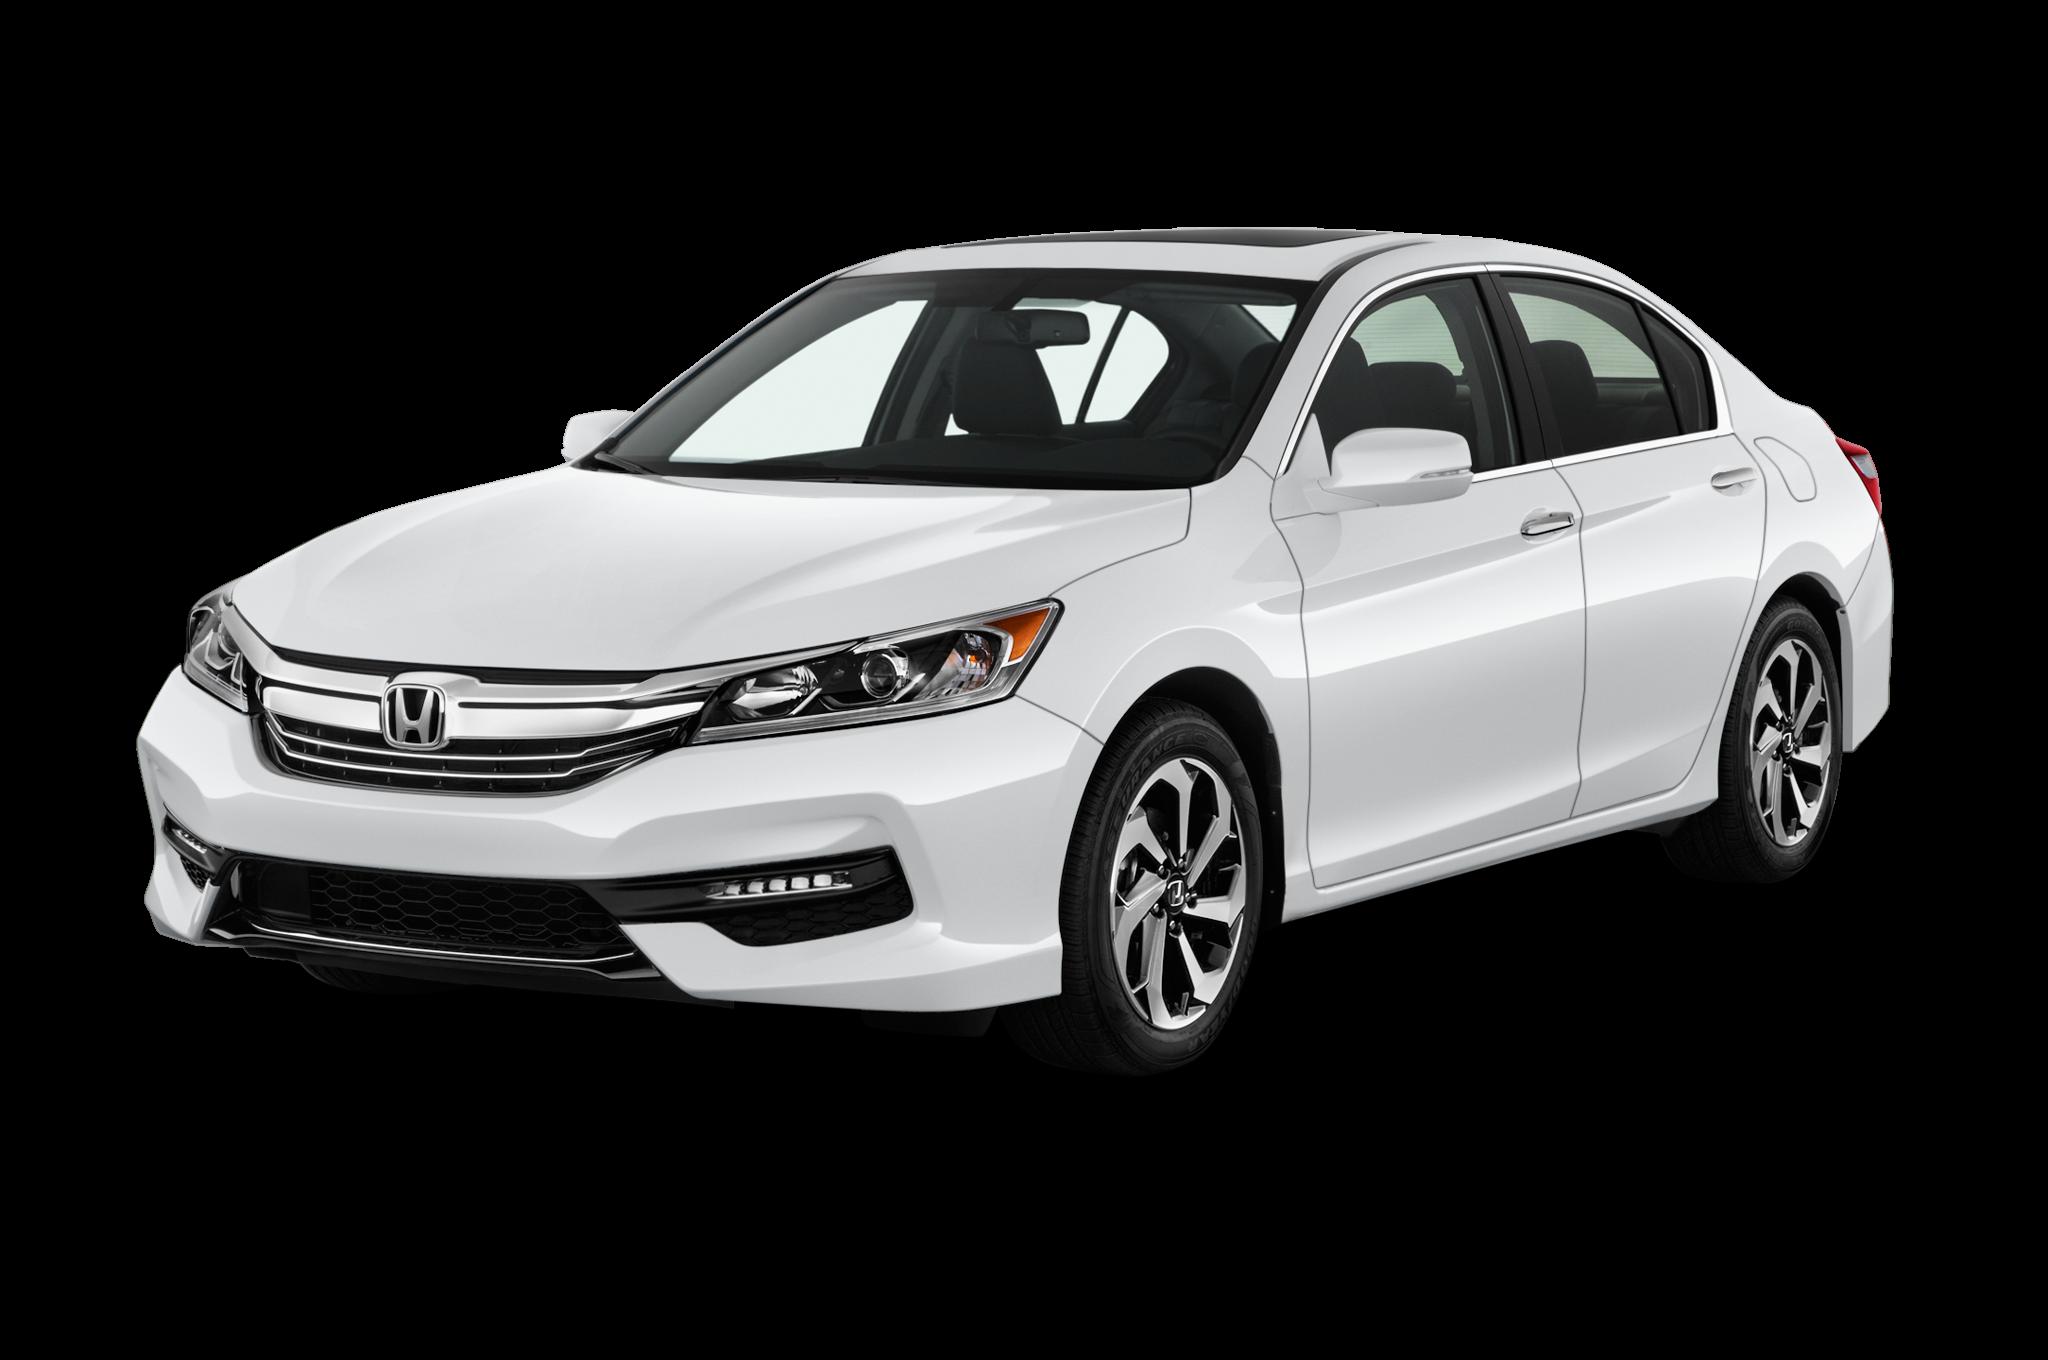 Honda ACCORD Sport CVT w Honda Sensing 2017 International Price